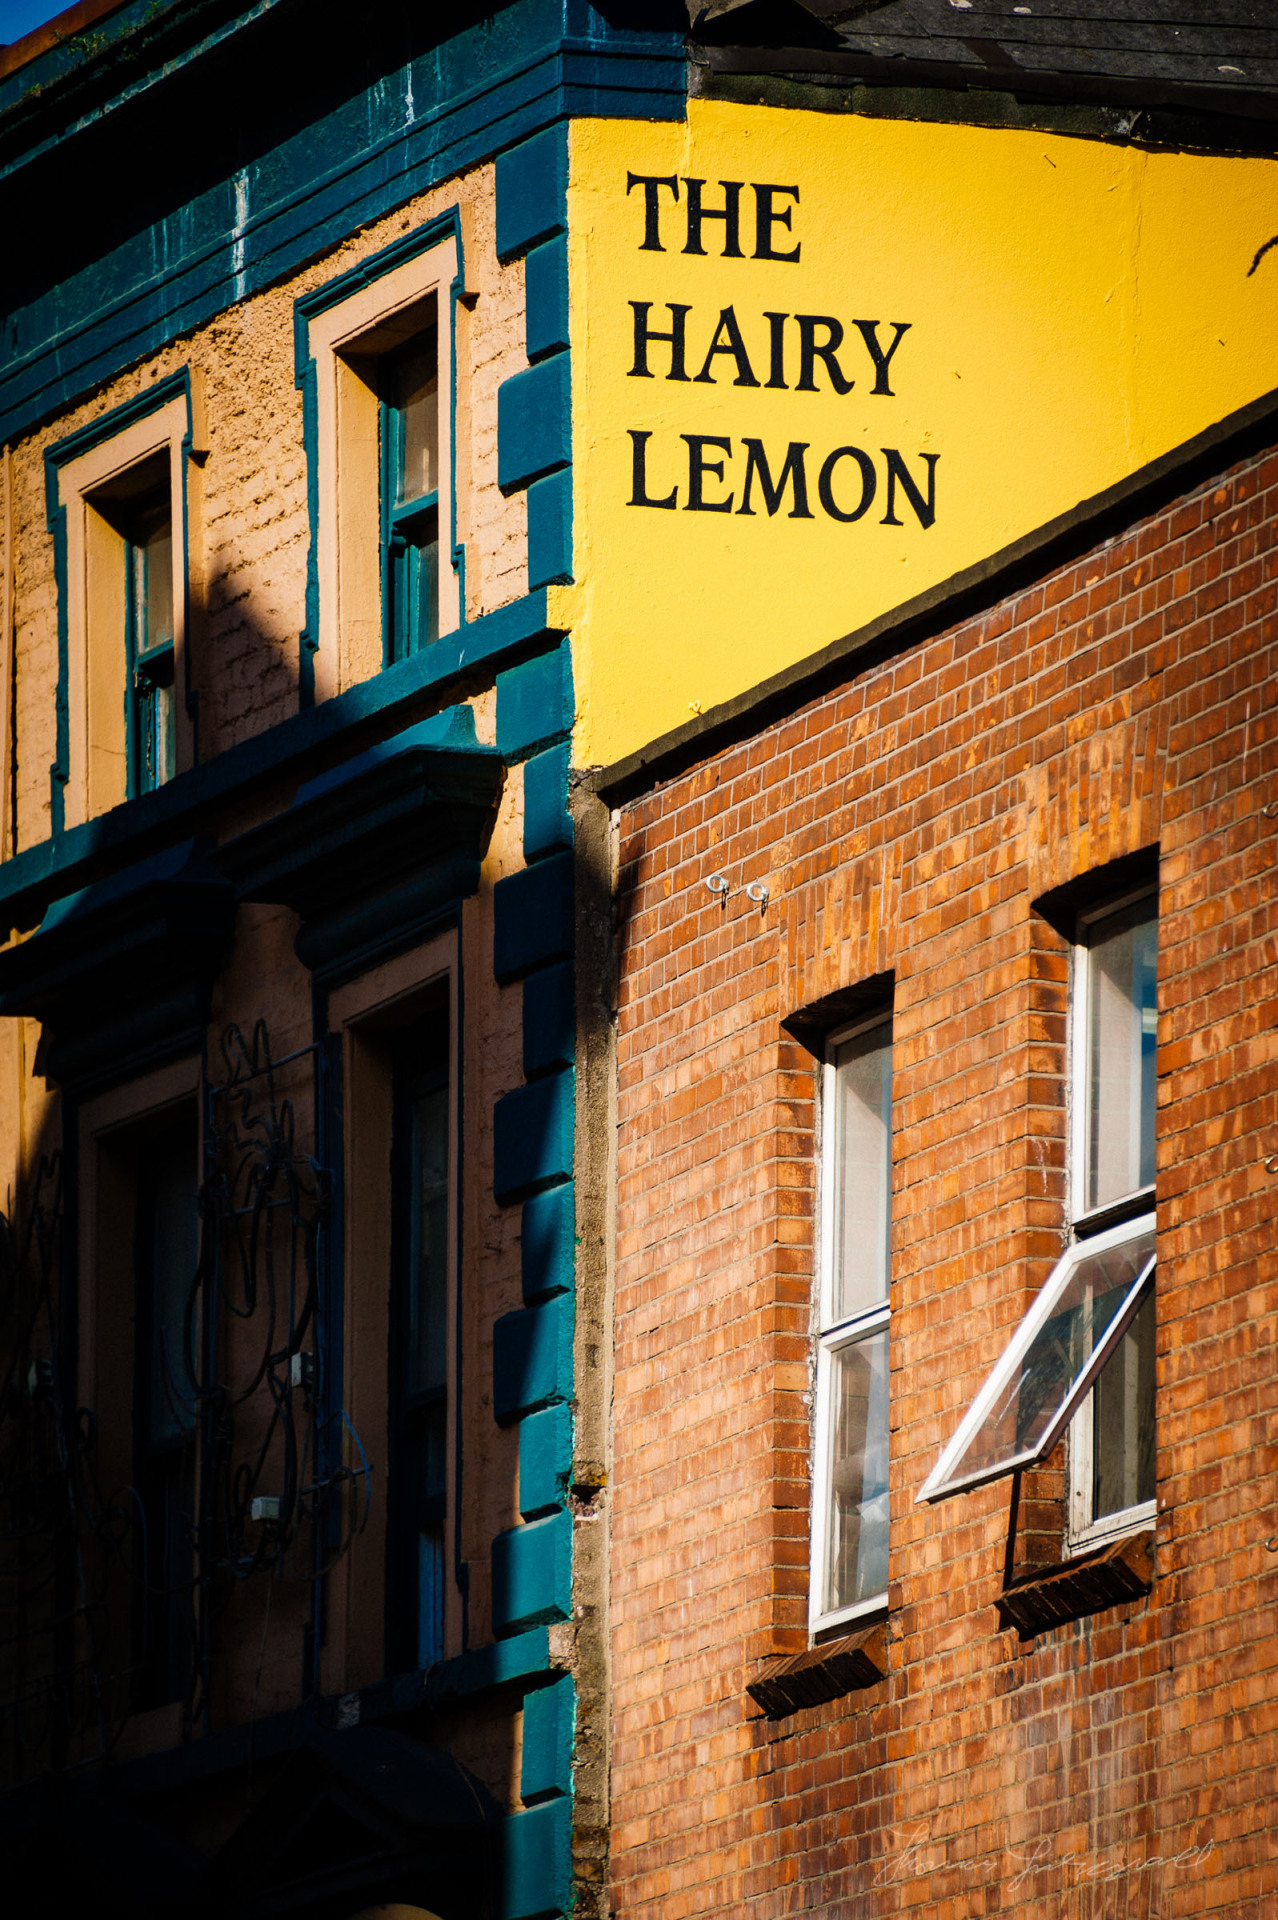 The Hairy Lemon